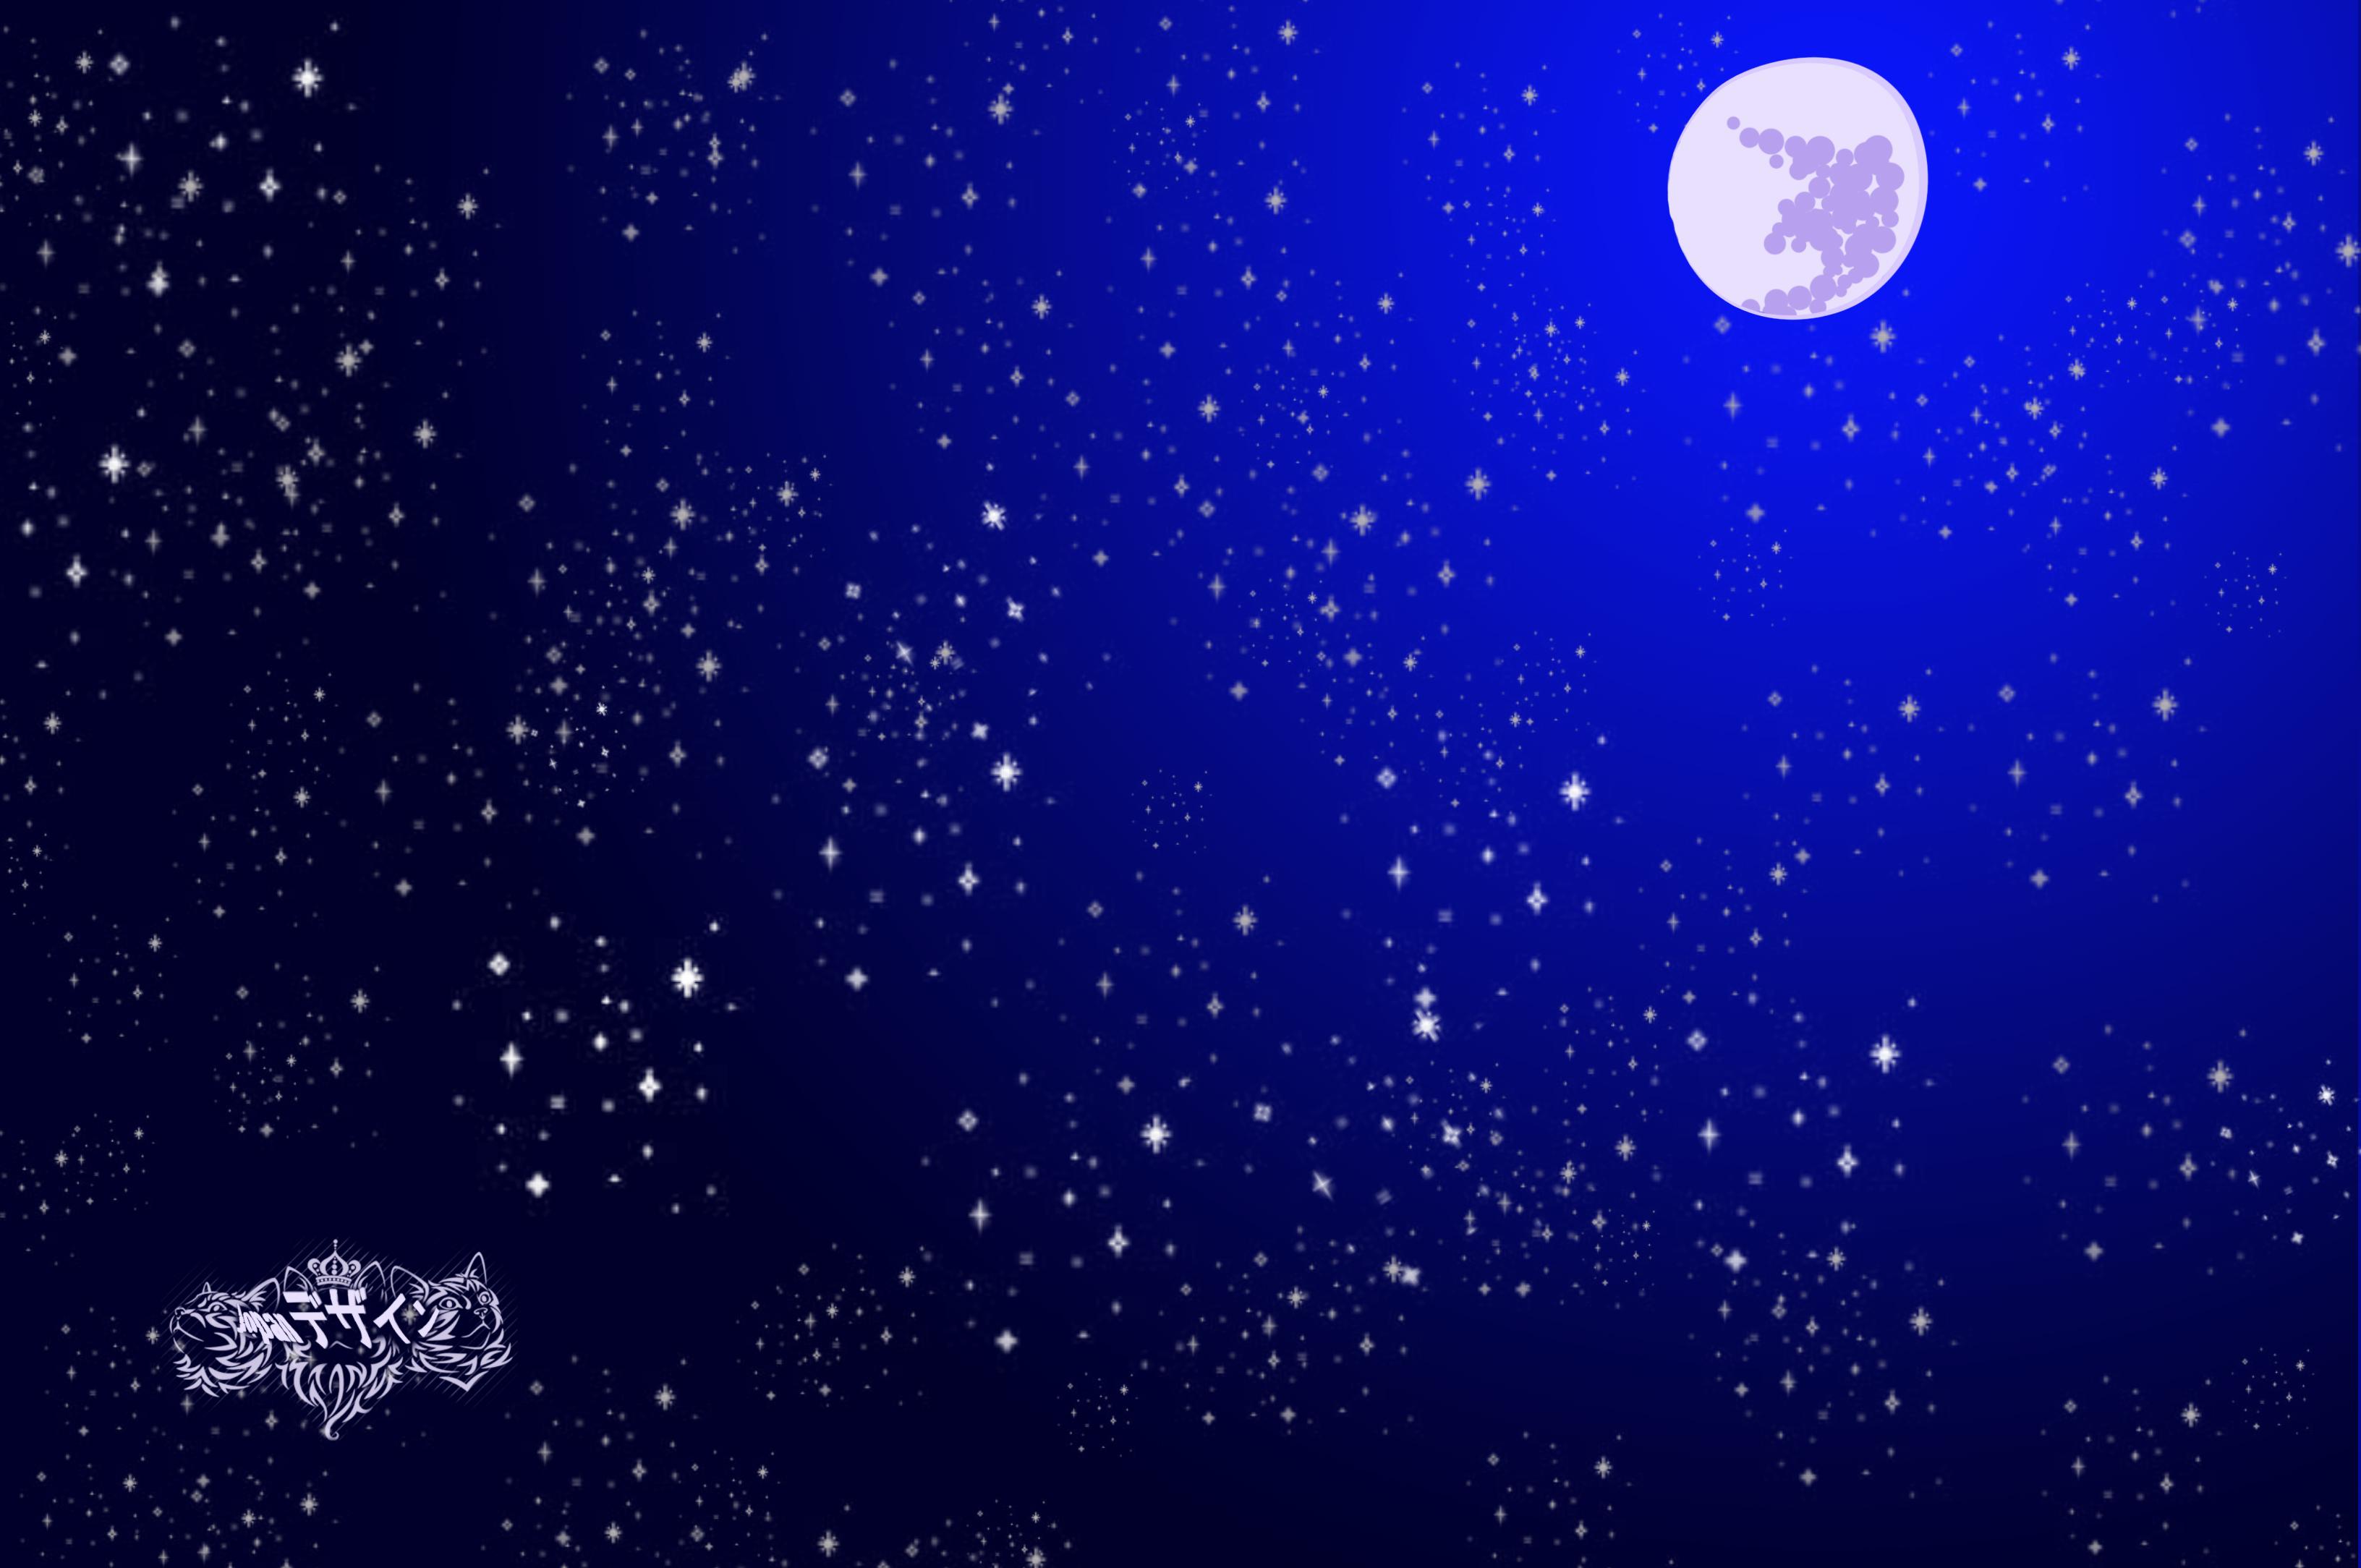 cartoon night vector wallpaper - photo #6